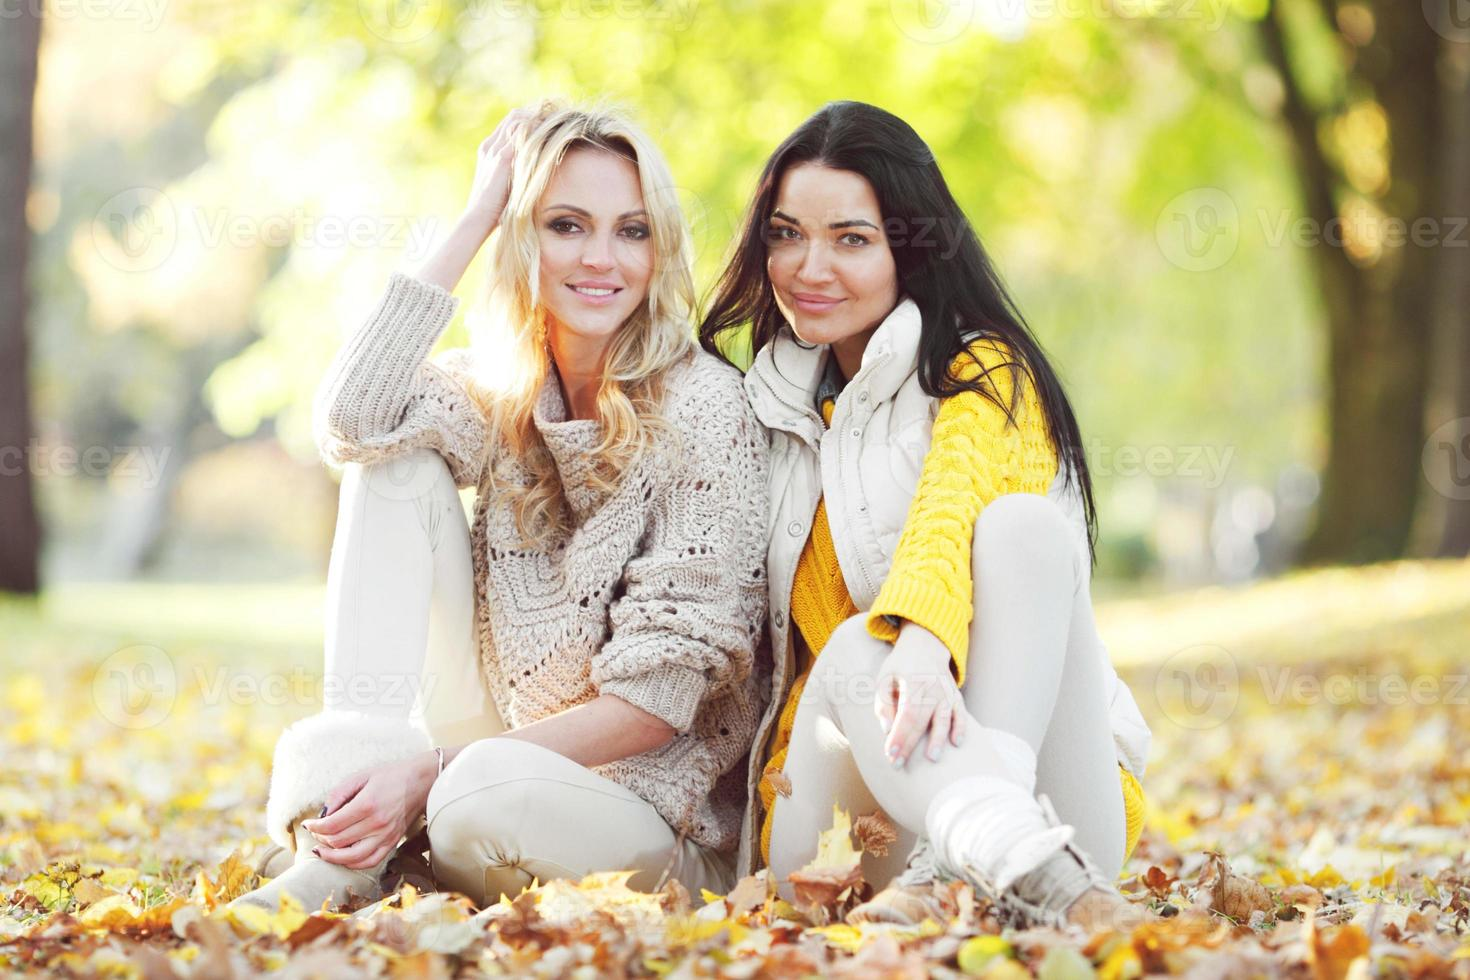 vrienden in herfst park foto